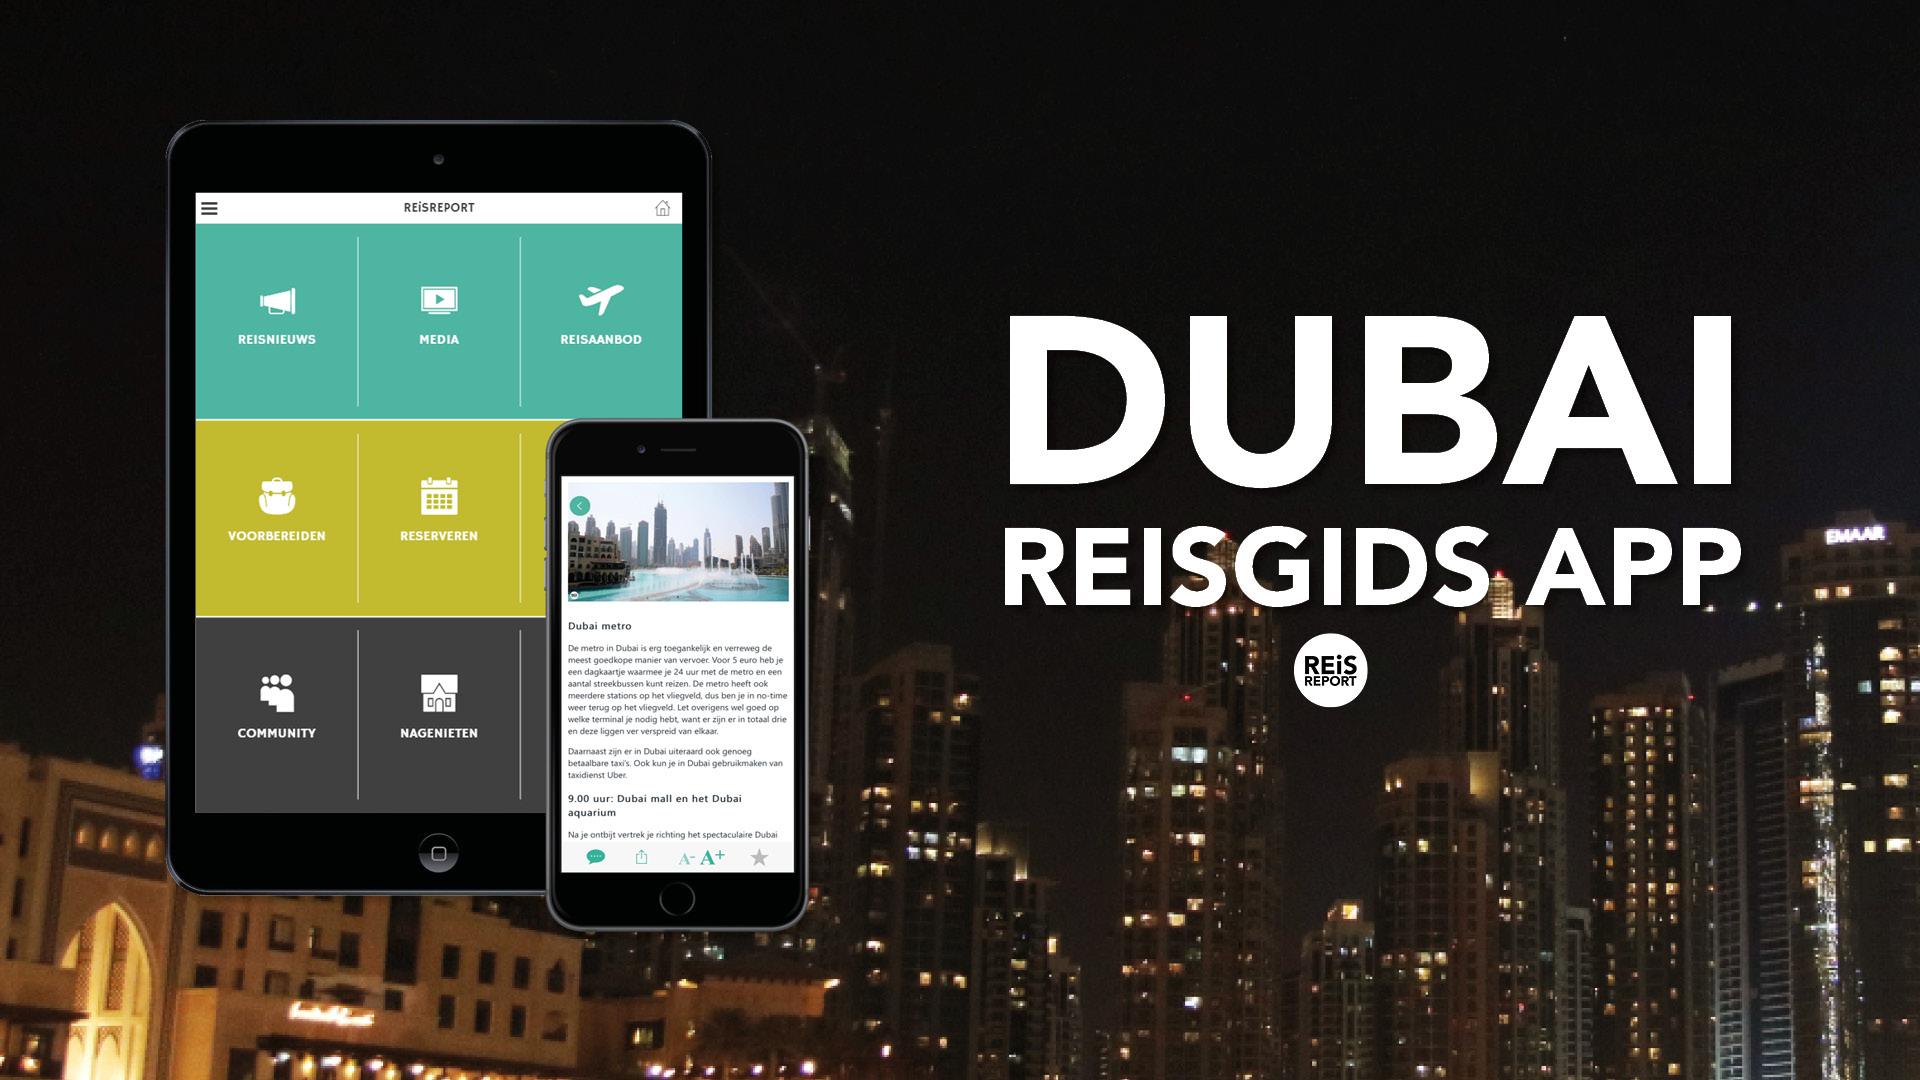 Dubai reisgids